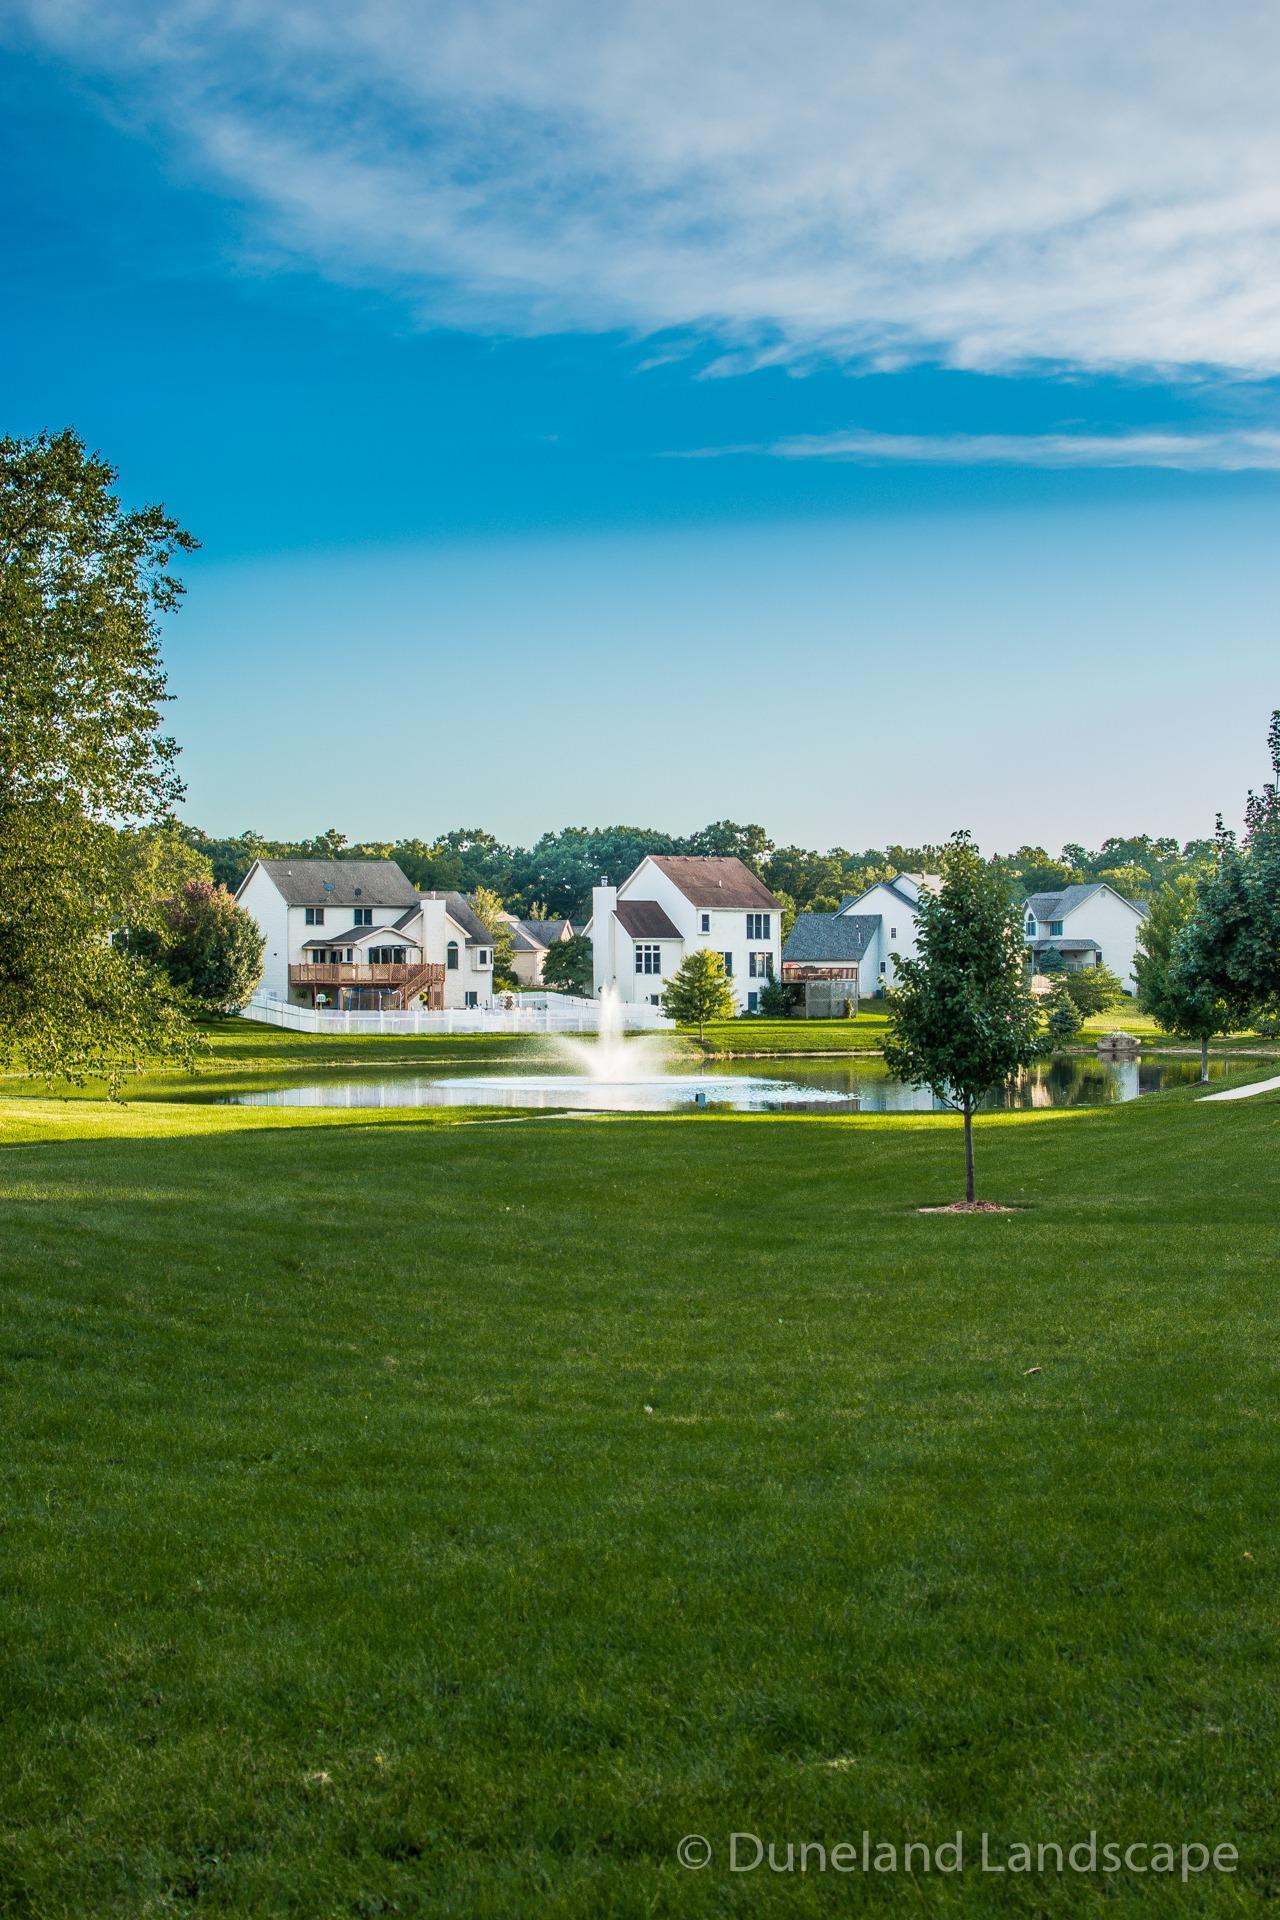 Indiana lawn care company